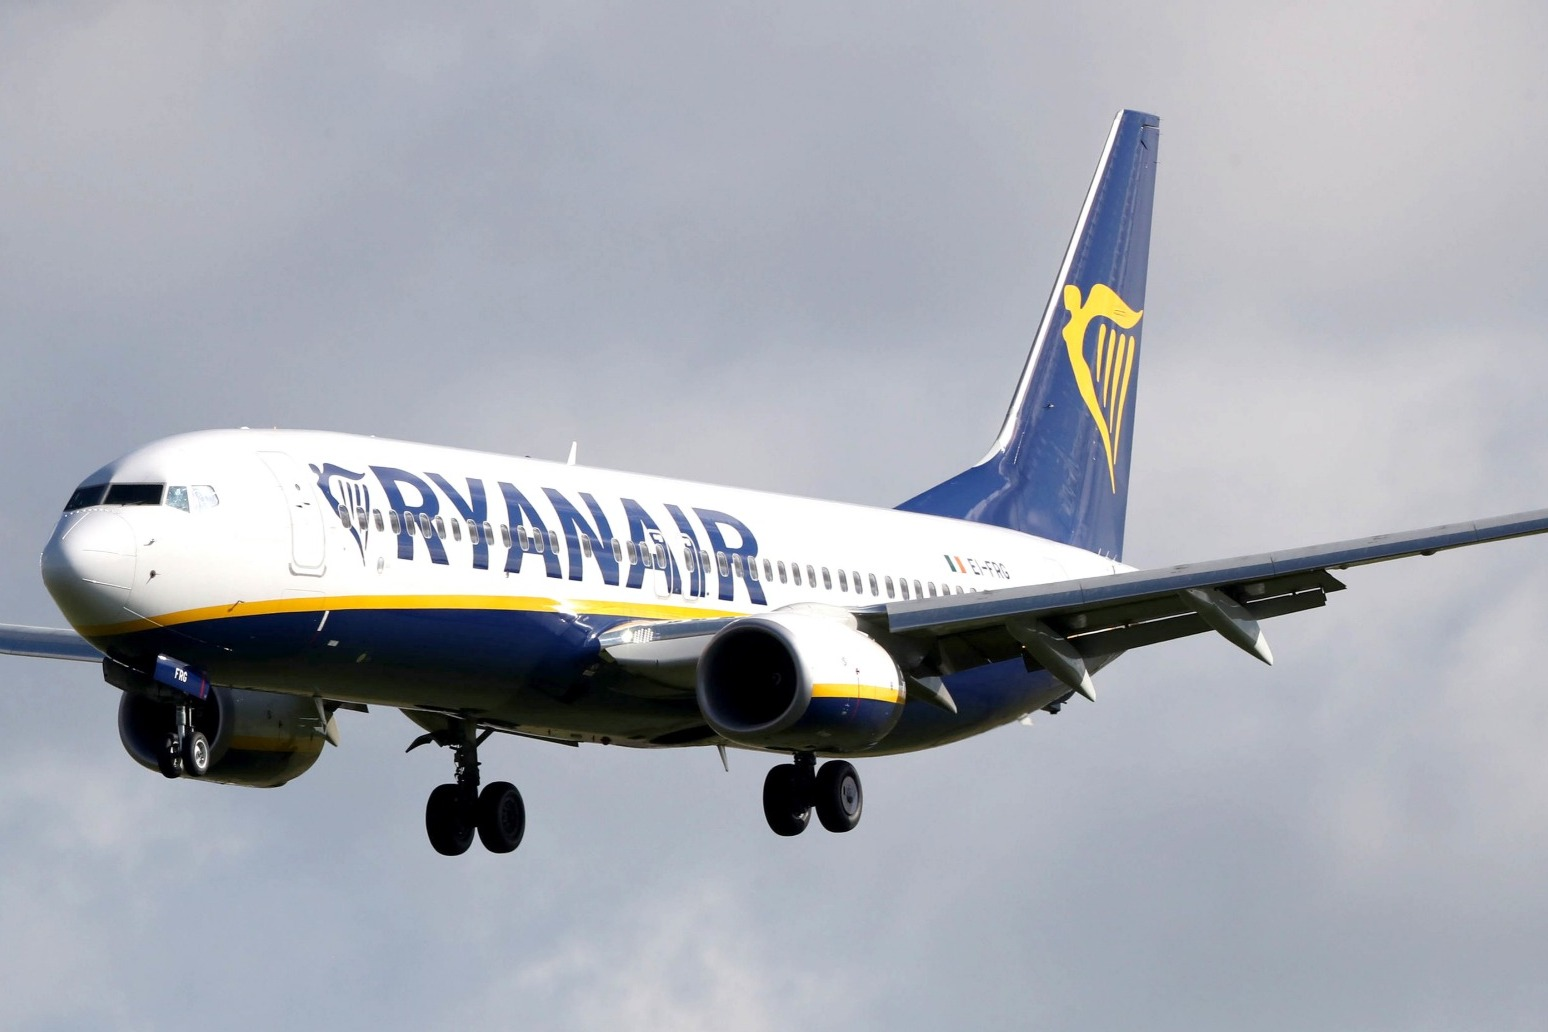 UK condemns Belarus after Ryanair flight carrying opposition activist diverted